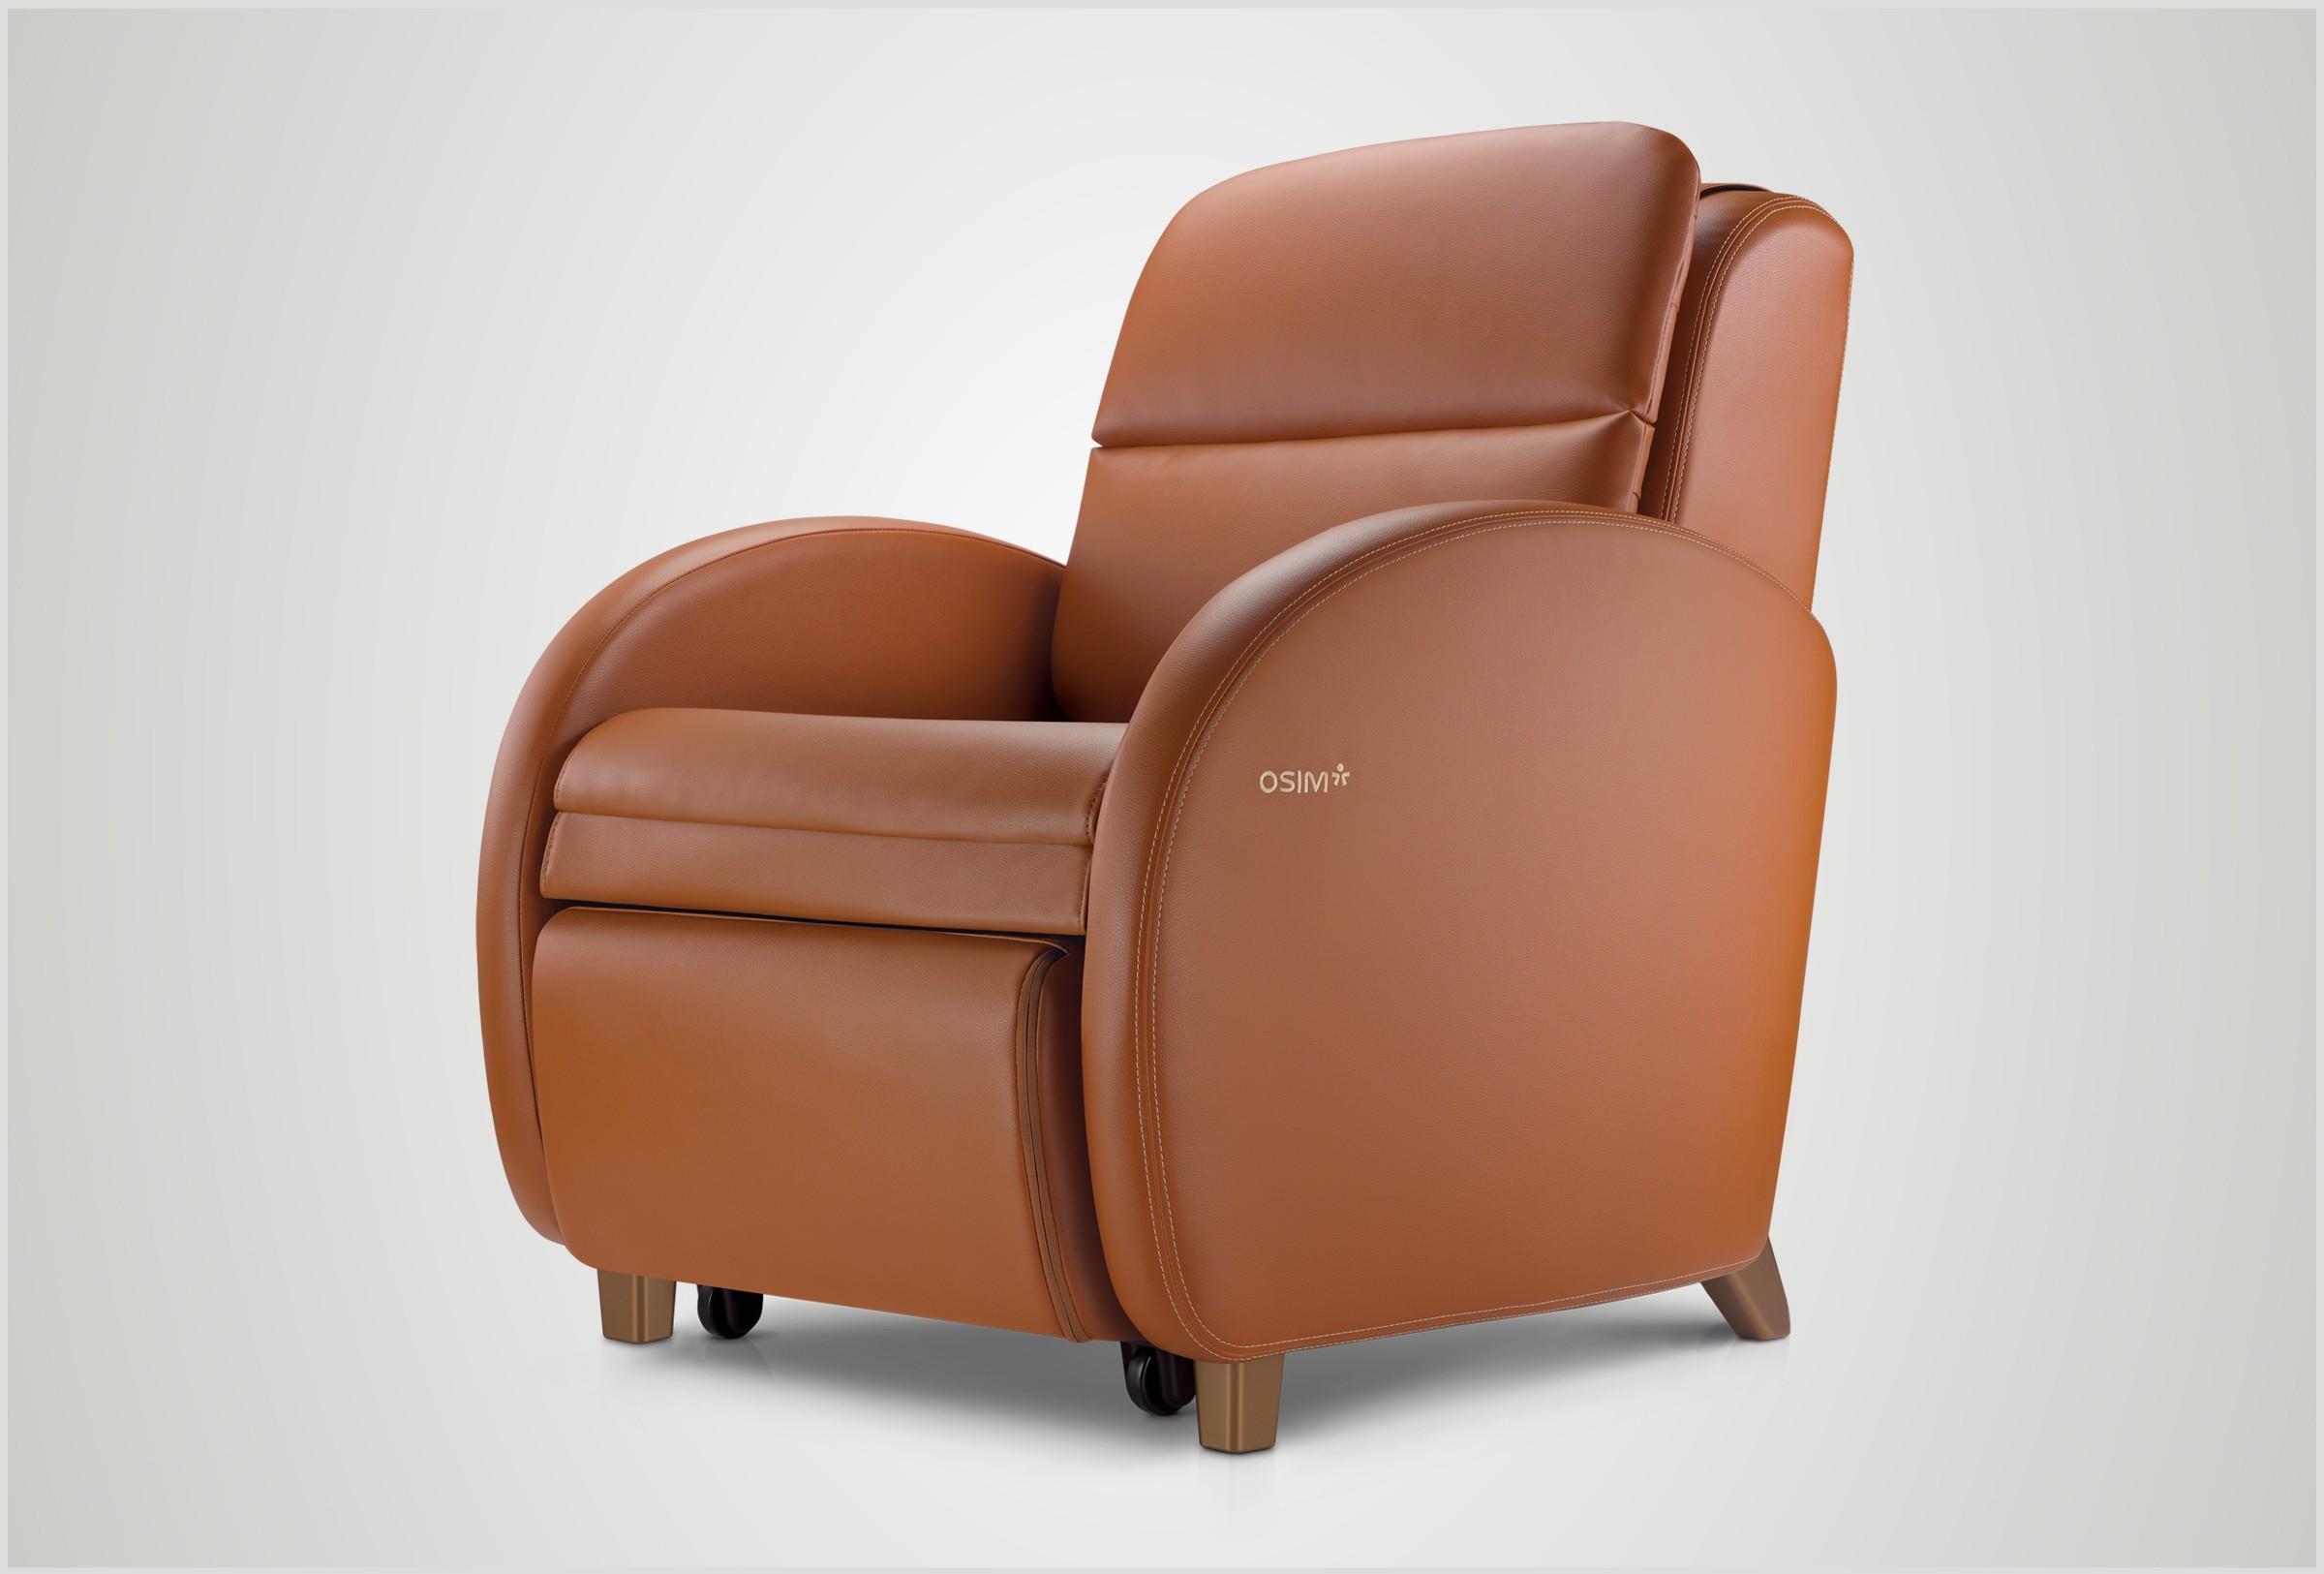 osim webshop osim udiva classic massage sofa